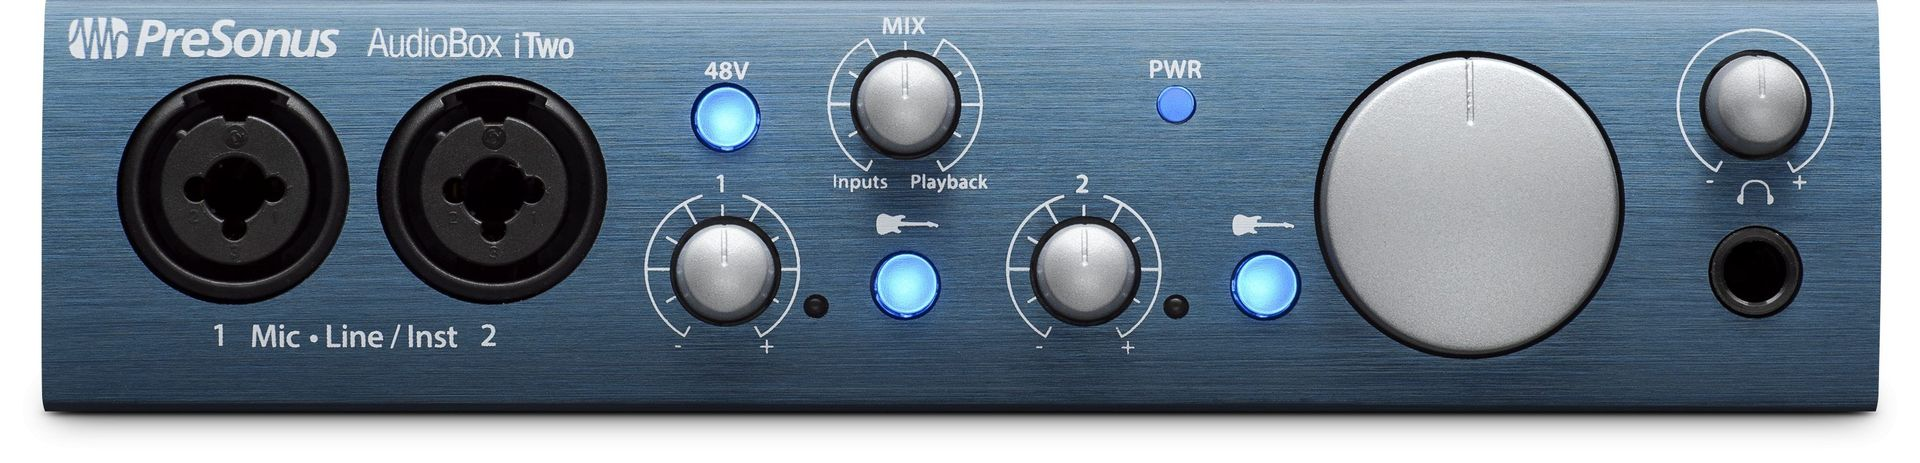 Presonus AudioBox iTwo USB 2.0 Audio Interface für iPad, Mac, PC mit Midi IN/OUT